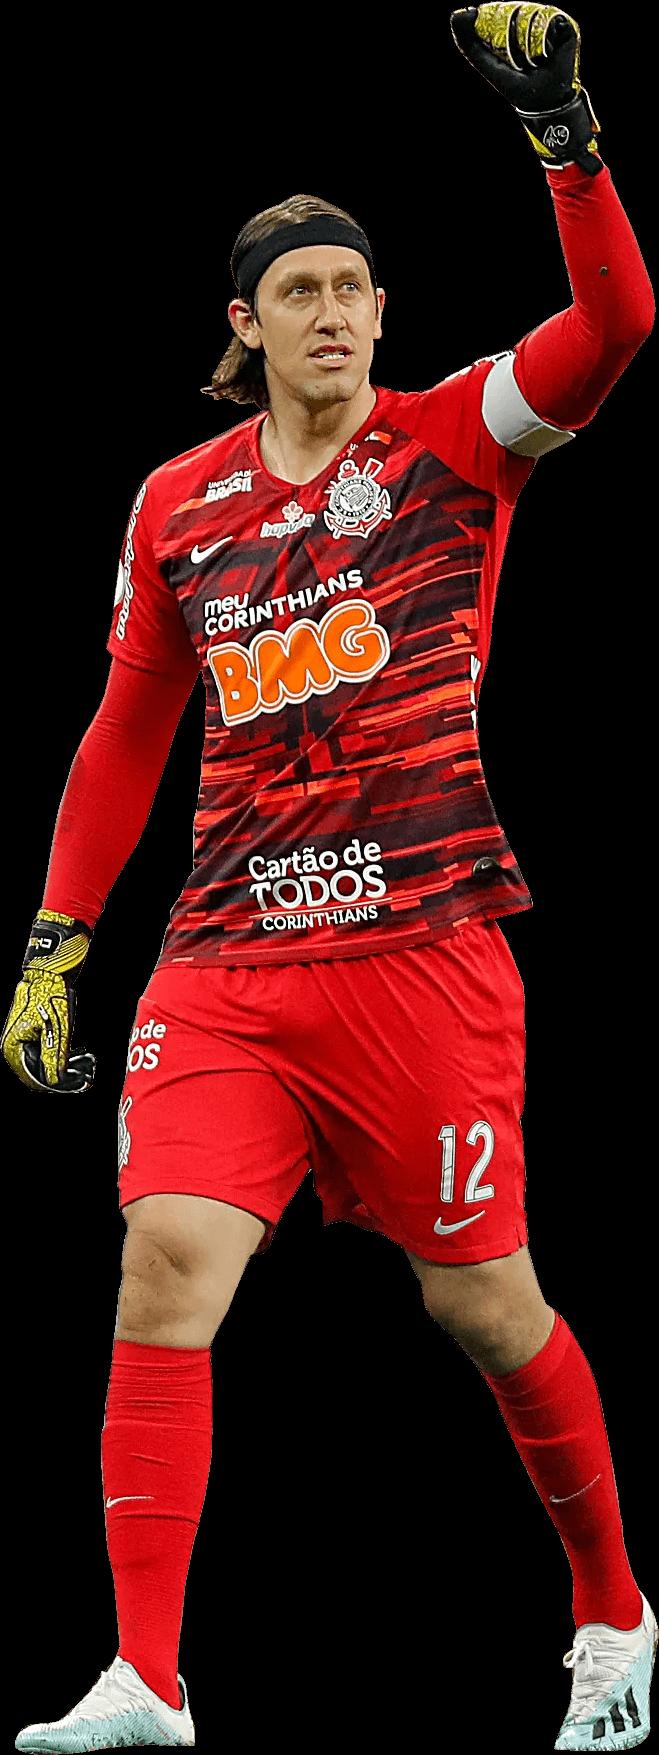 Cássio Ramosrender